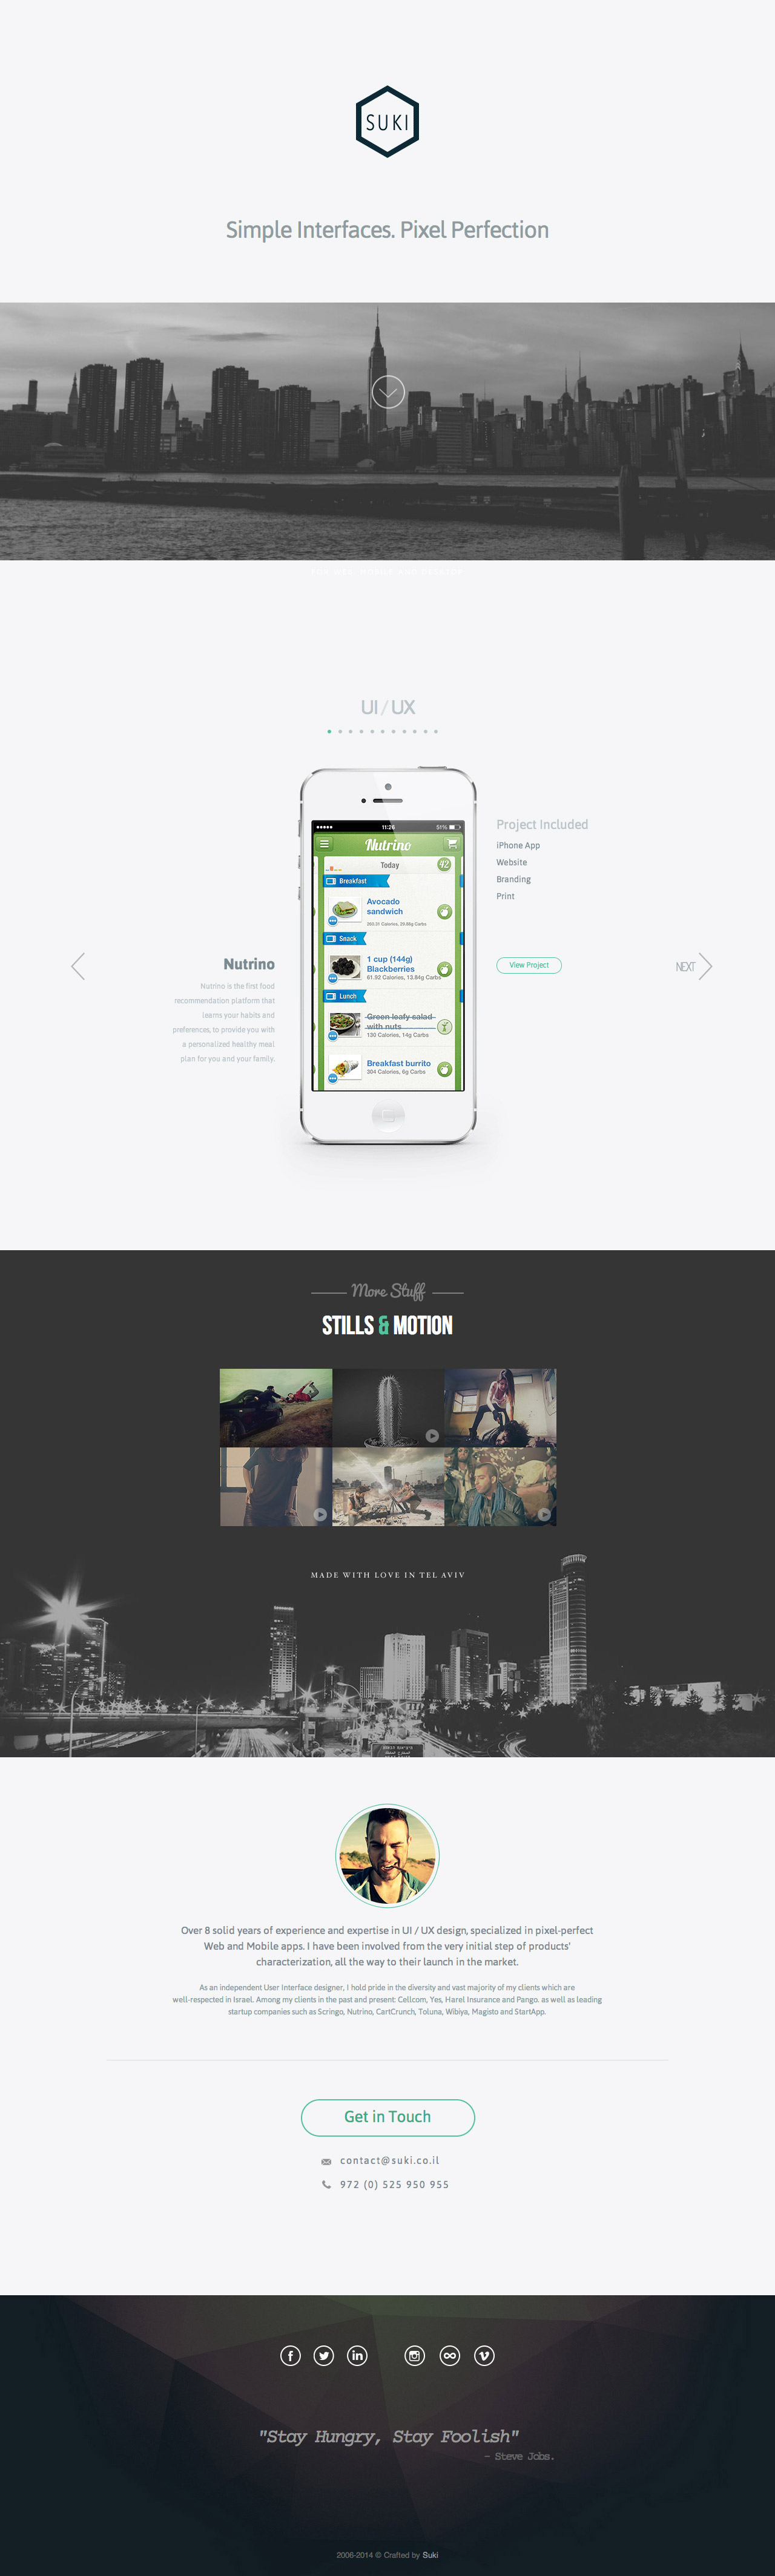 Suki Website Screenshot